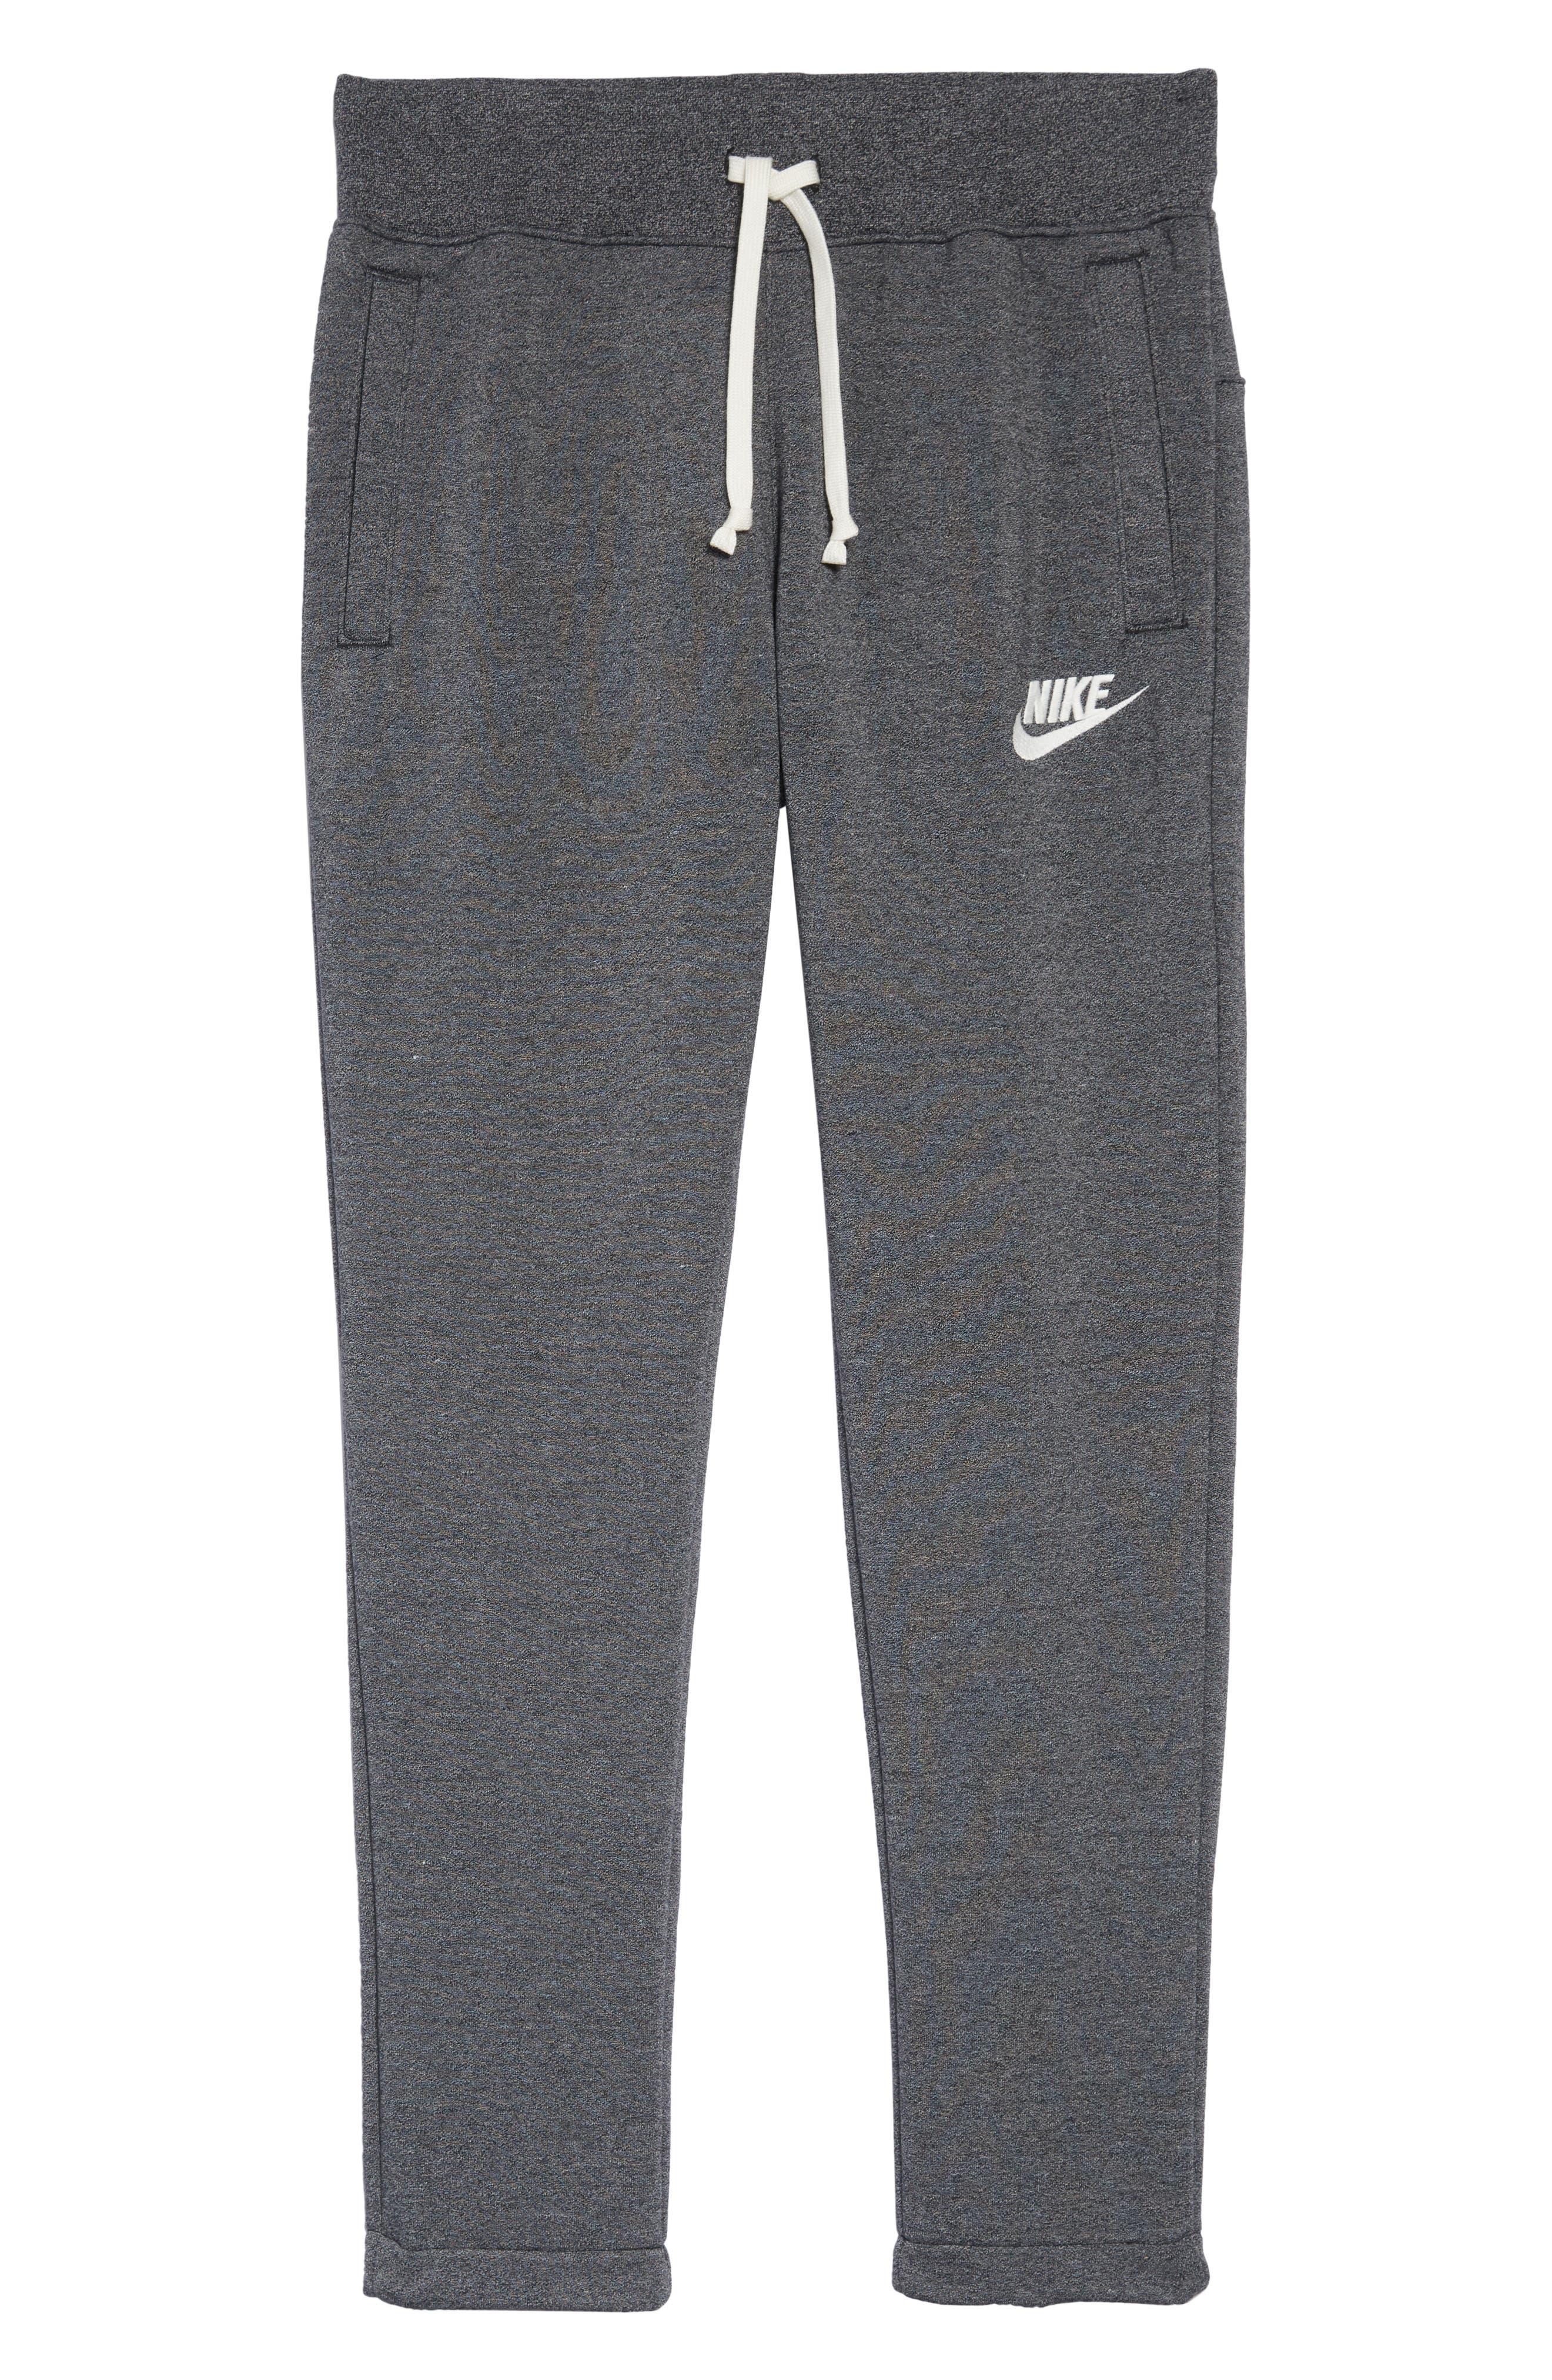 Sportswear ACG Heritage Pants,                             Alternate thumbnail 6, color,                             BLACK/ HTR/ SAIL